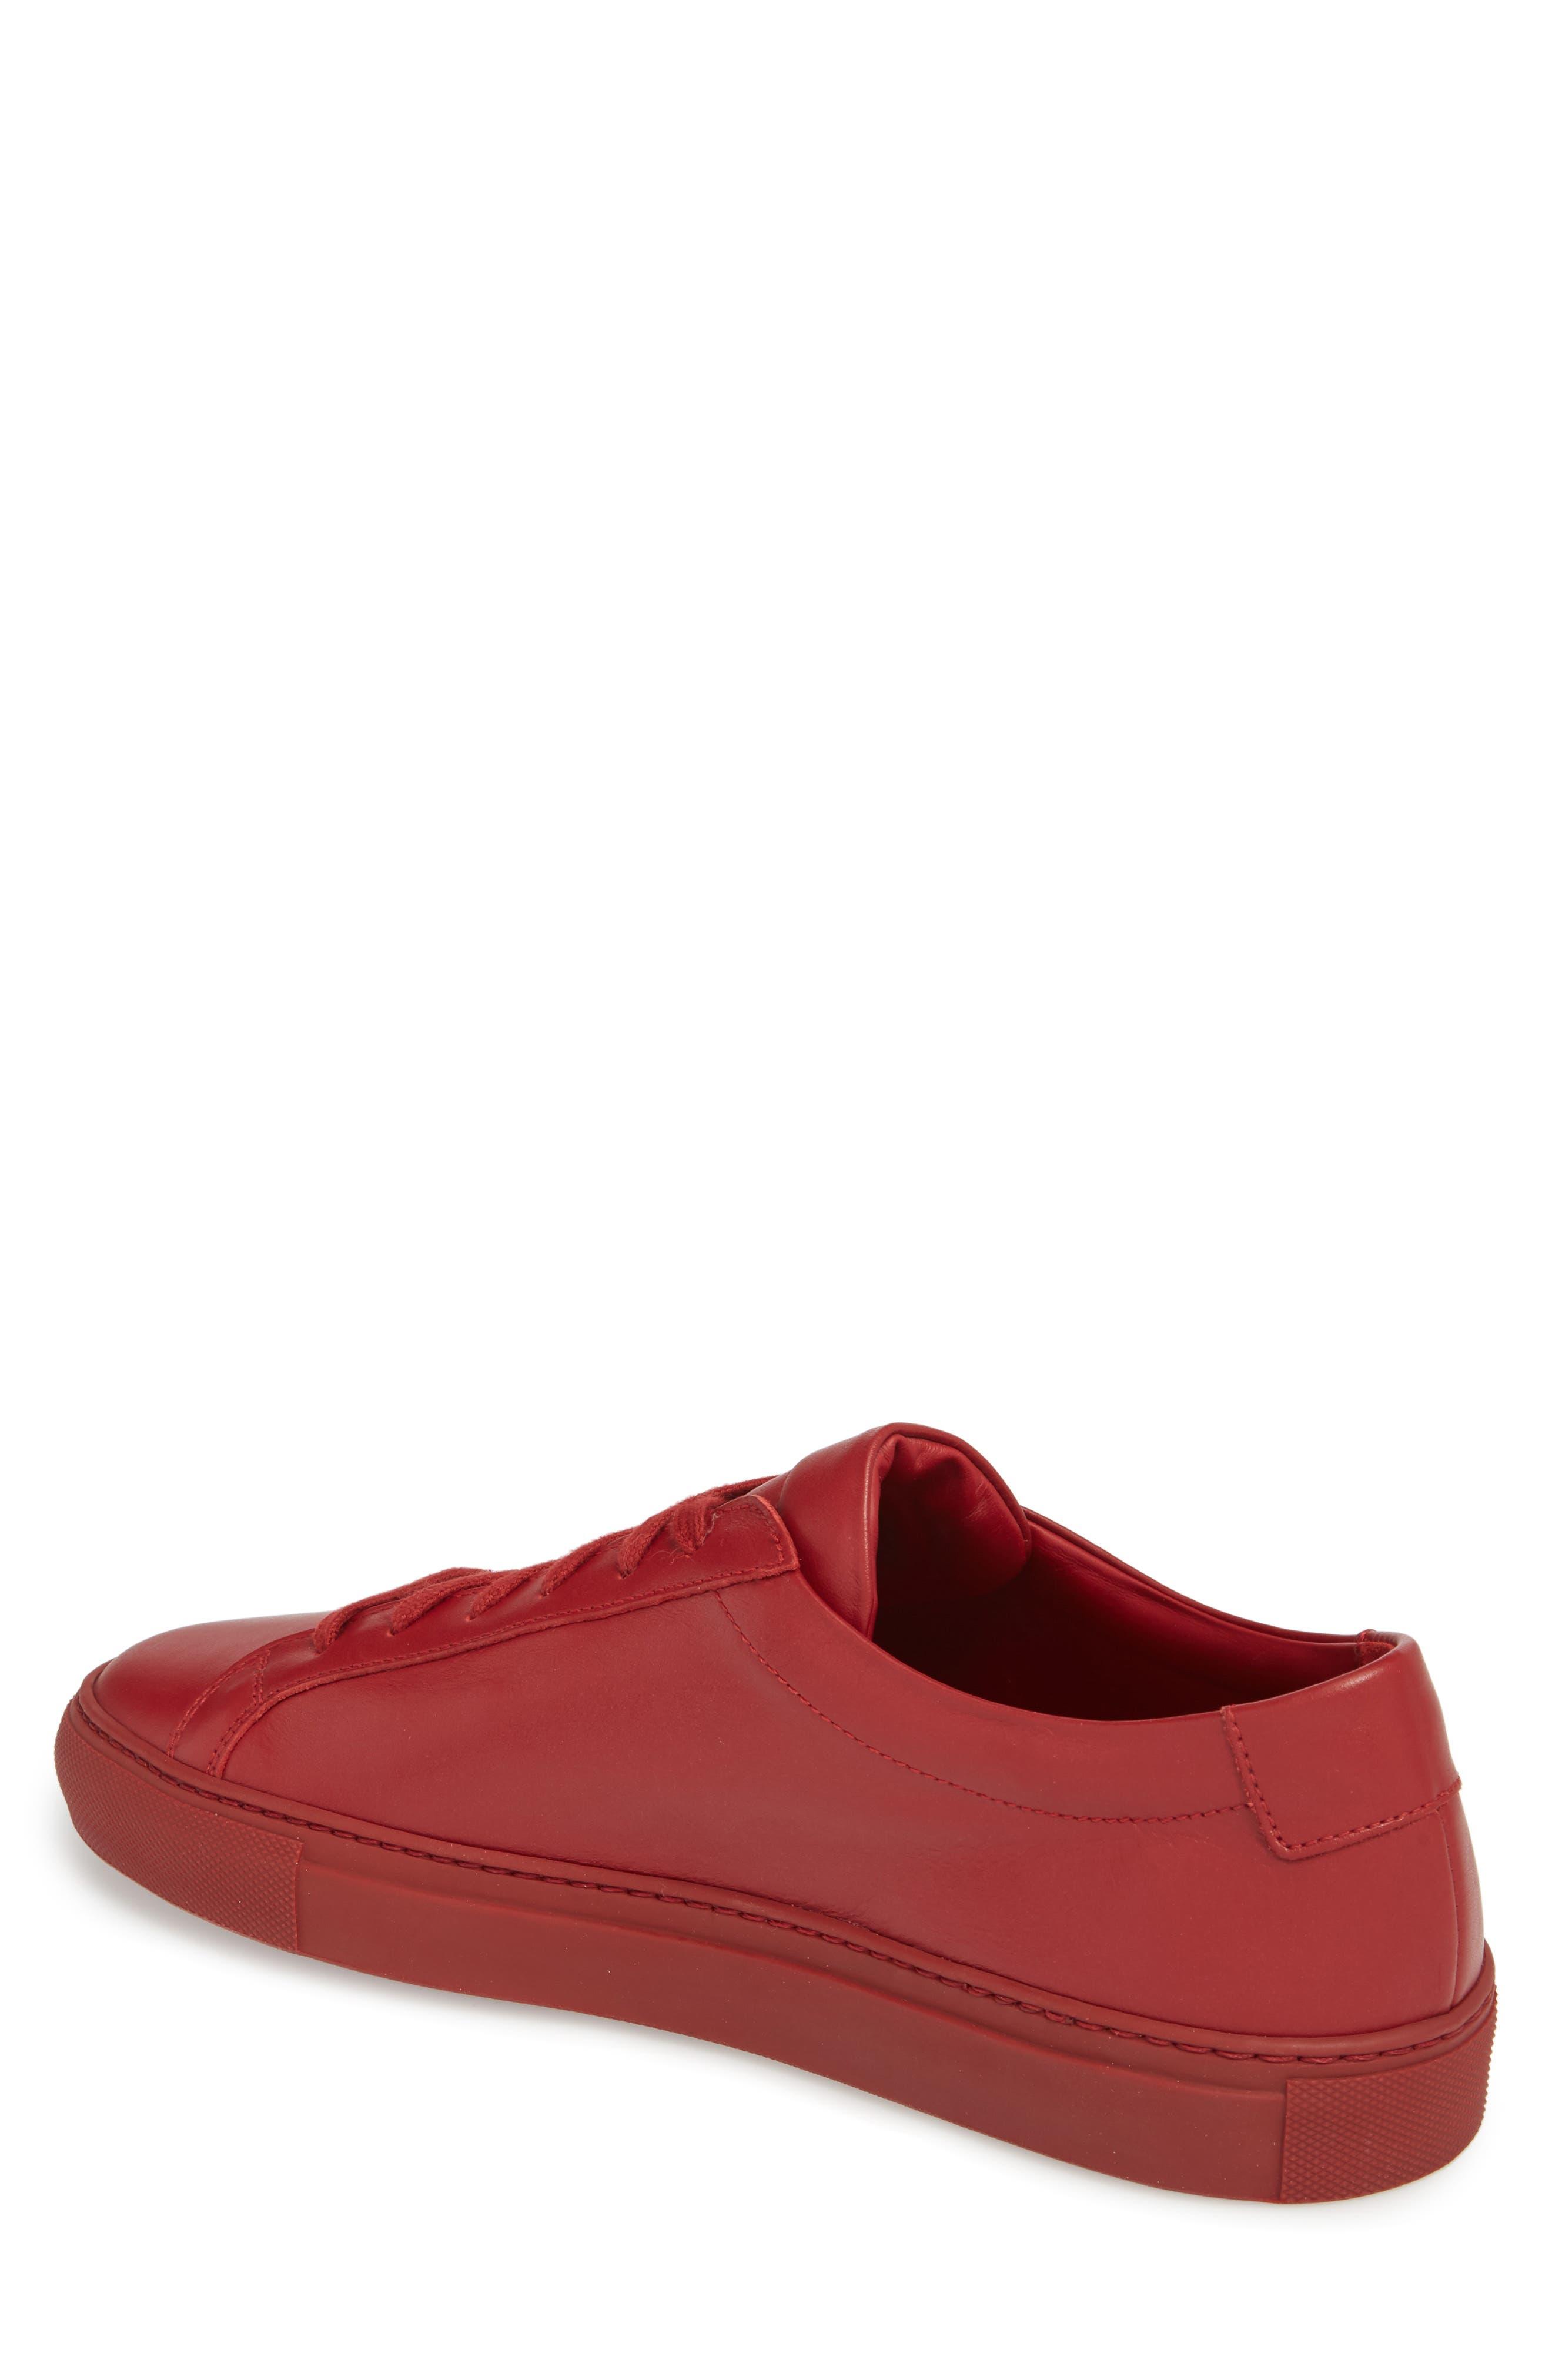 Original Achilles Sneaker,                             Alternate thumbnail 2, color,                             RED LEATHER